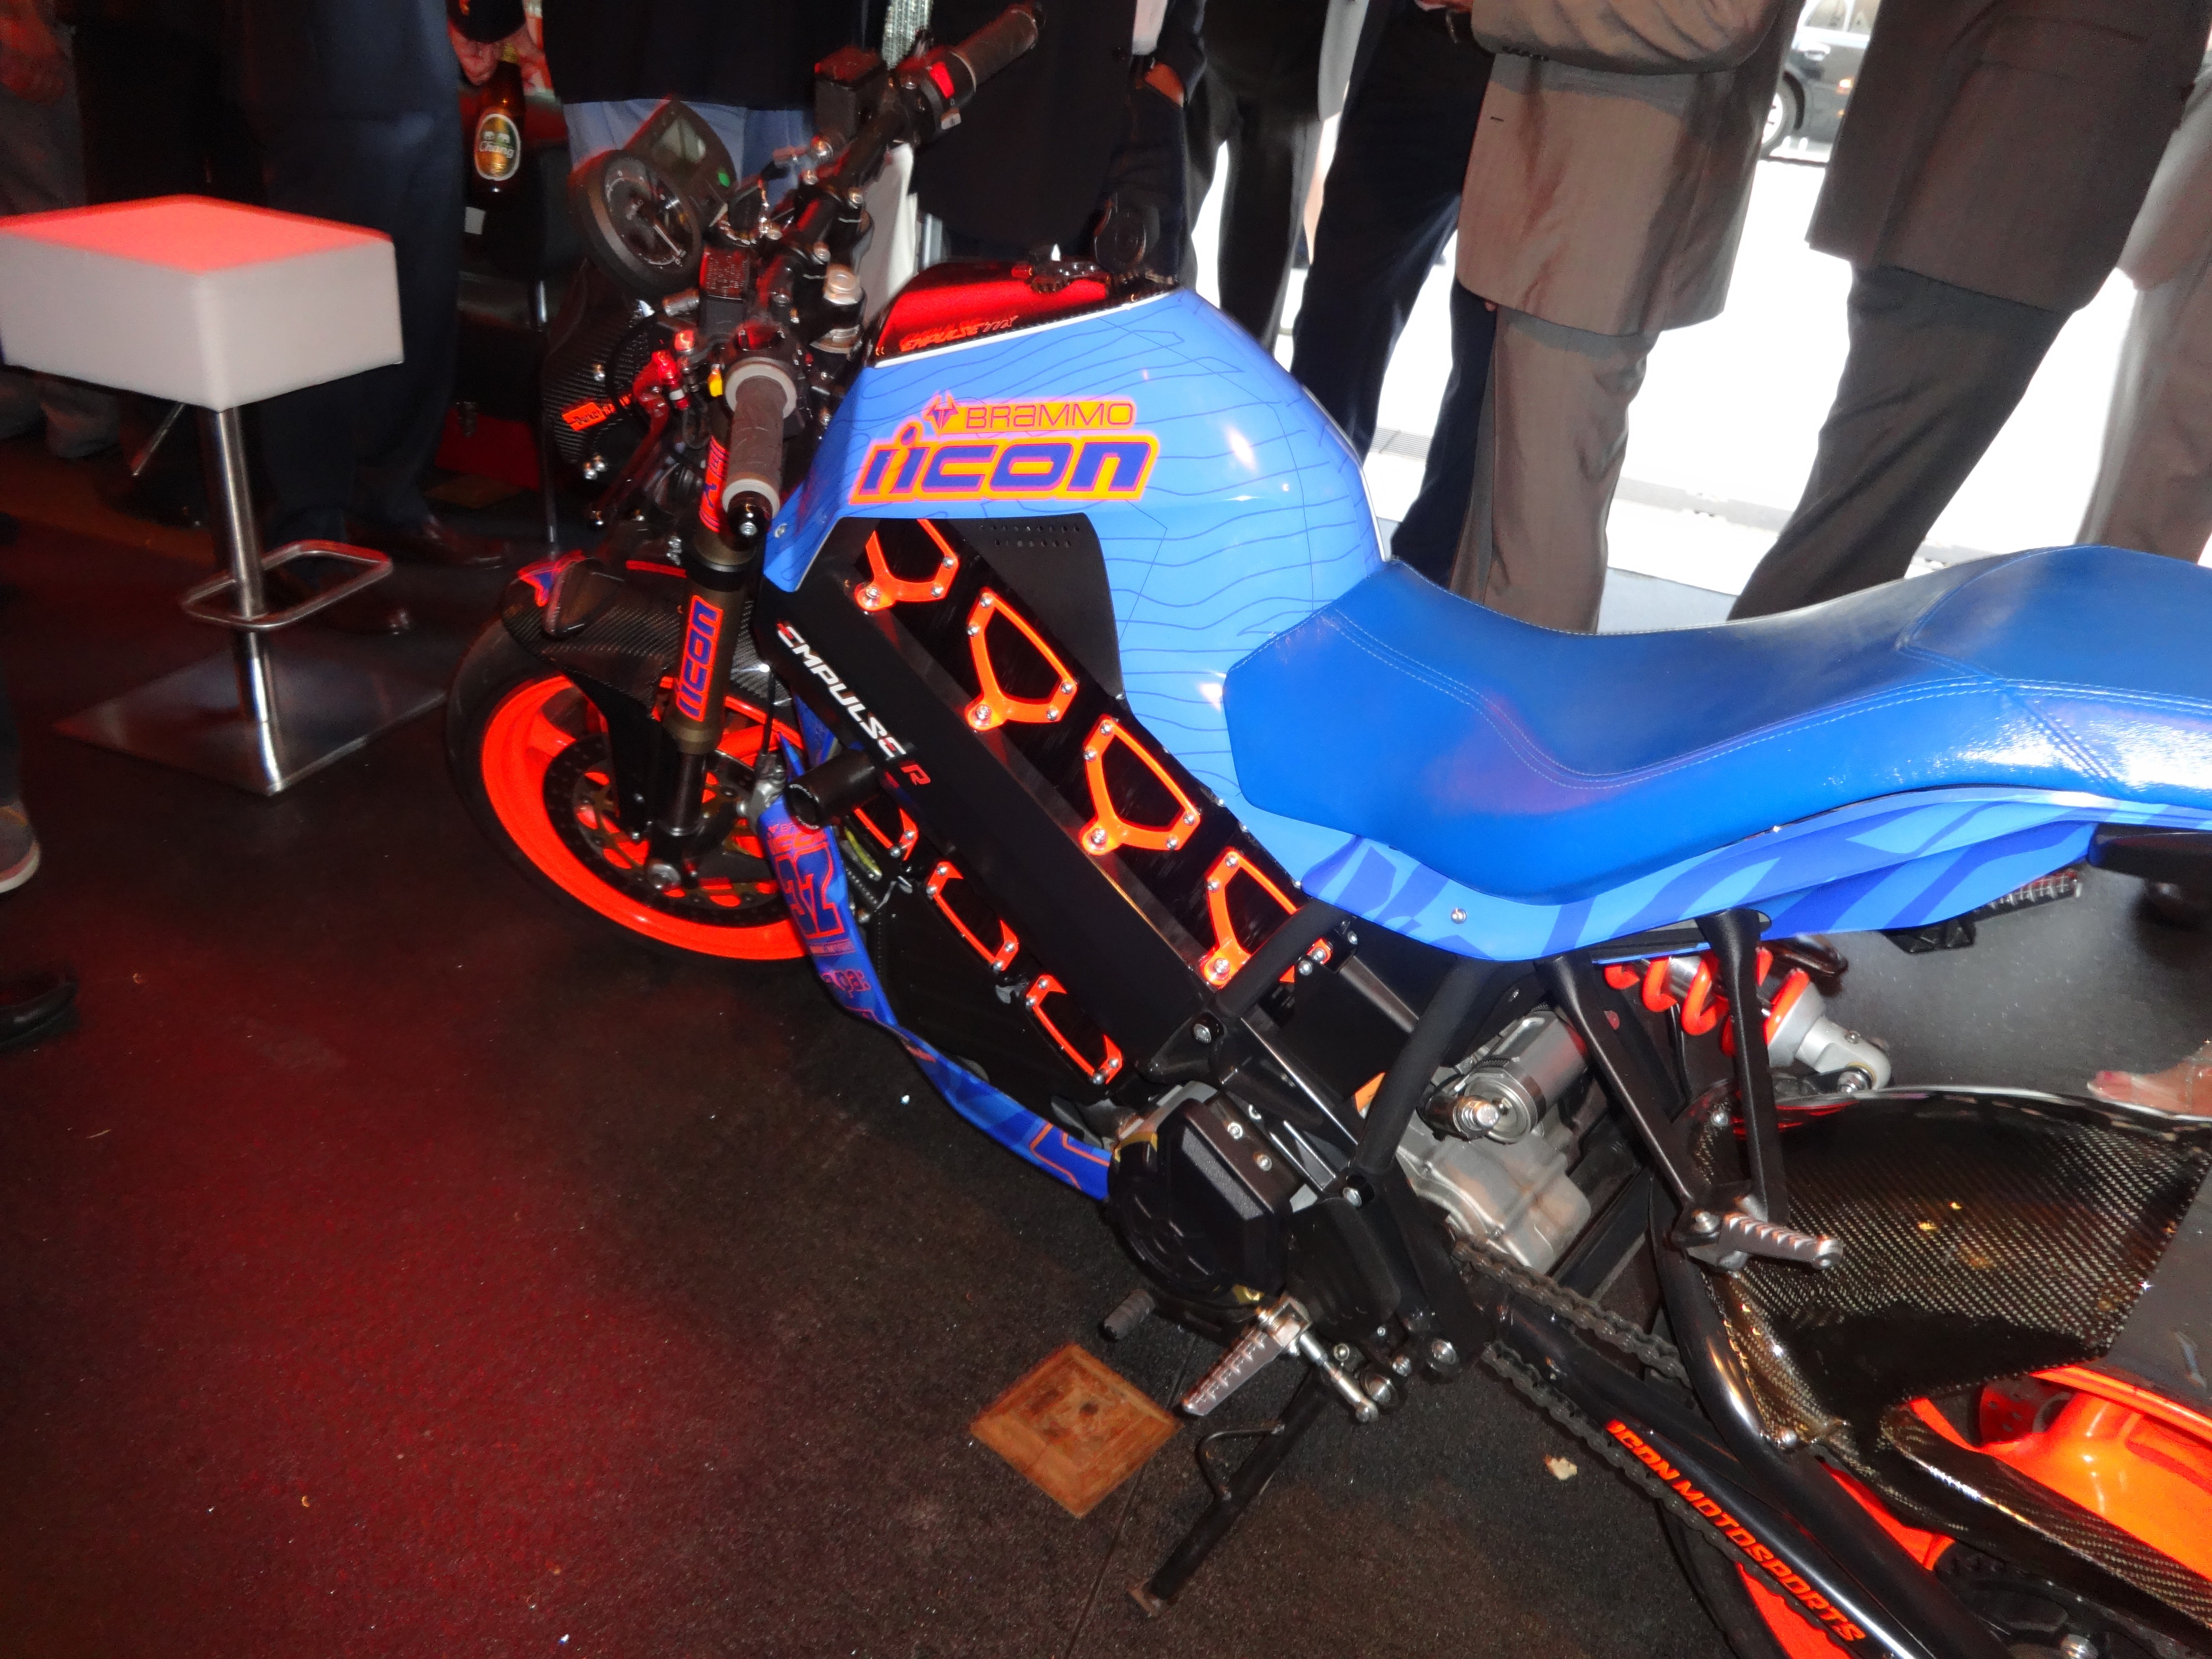 Wilzig blue electric bike